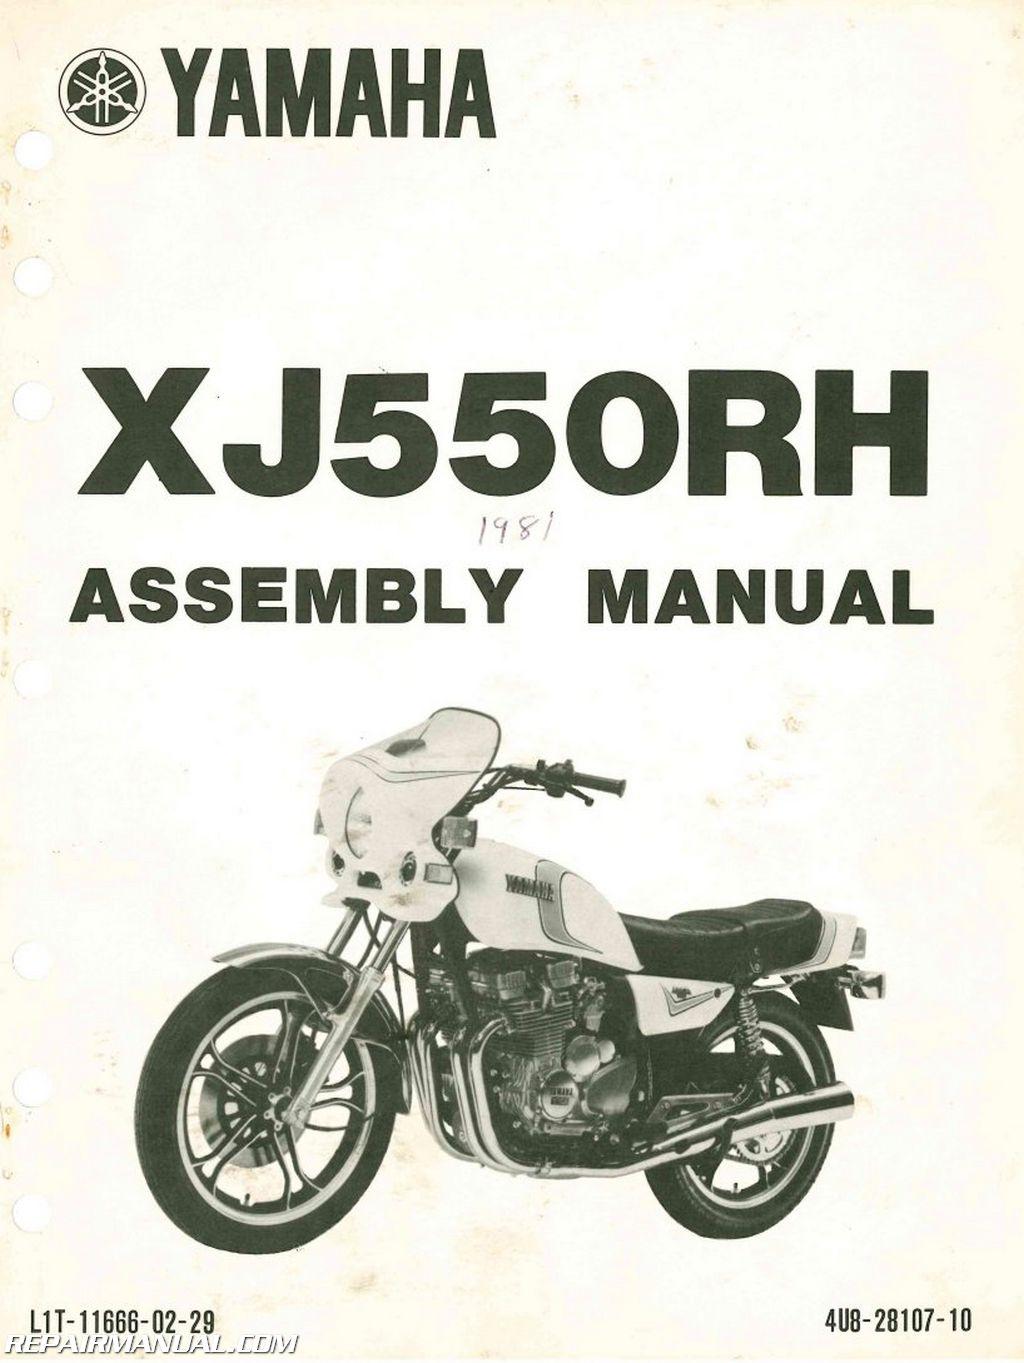 1981 yamaha xj550rh seca assembly manual. Black Bedroom Furniture Sets. Home Design Ideas